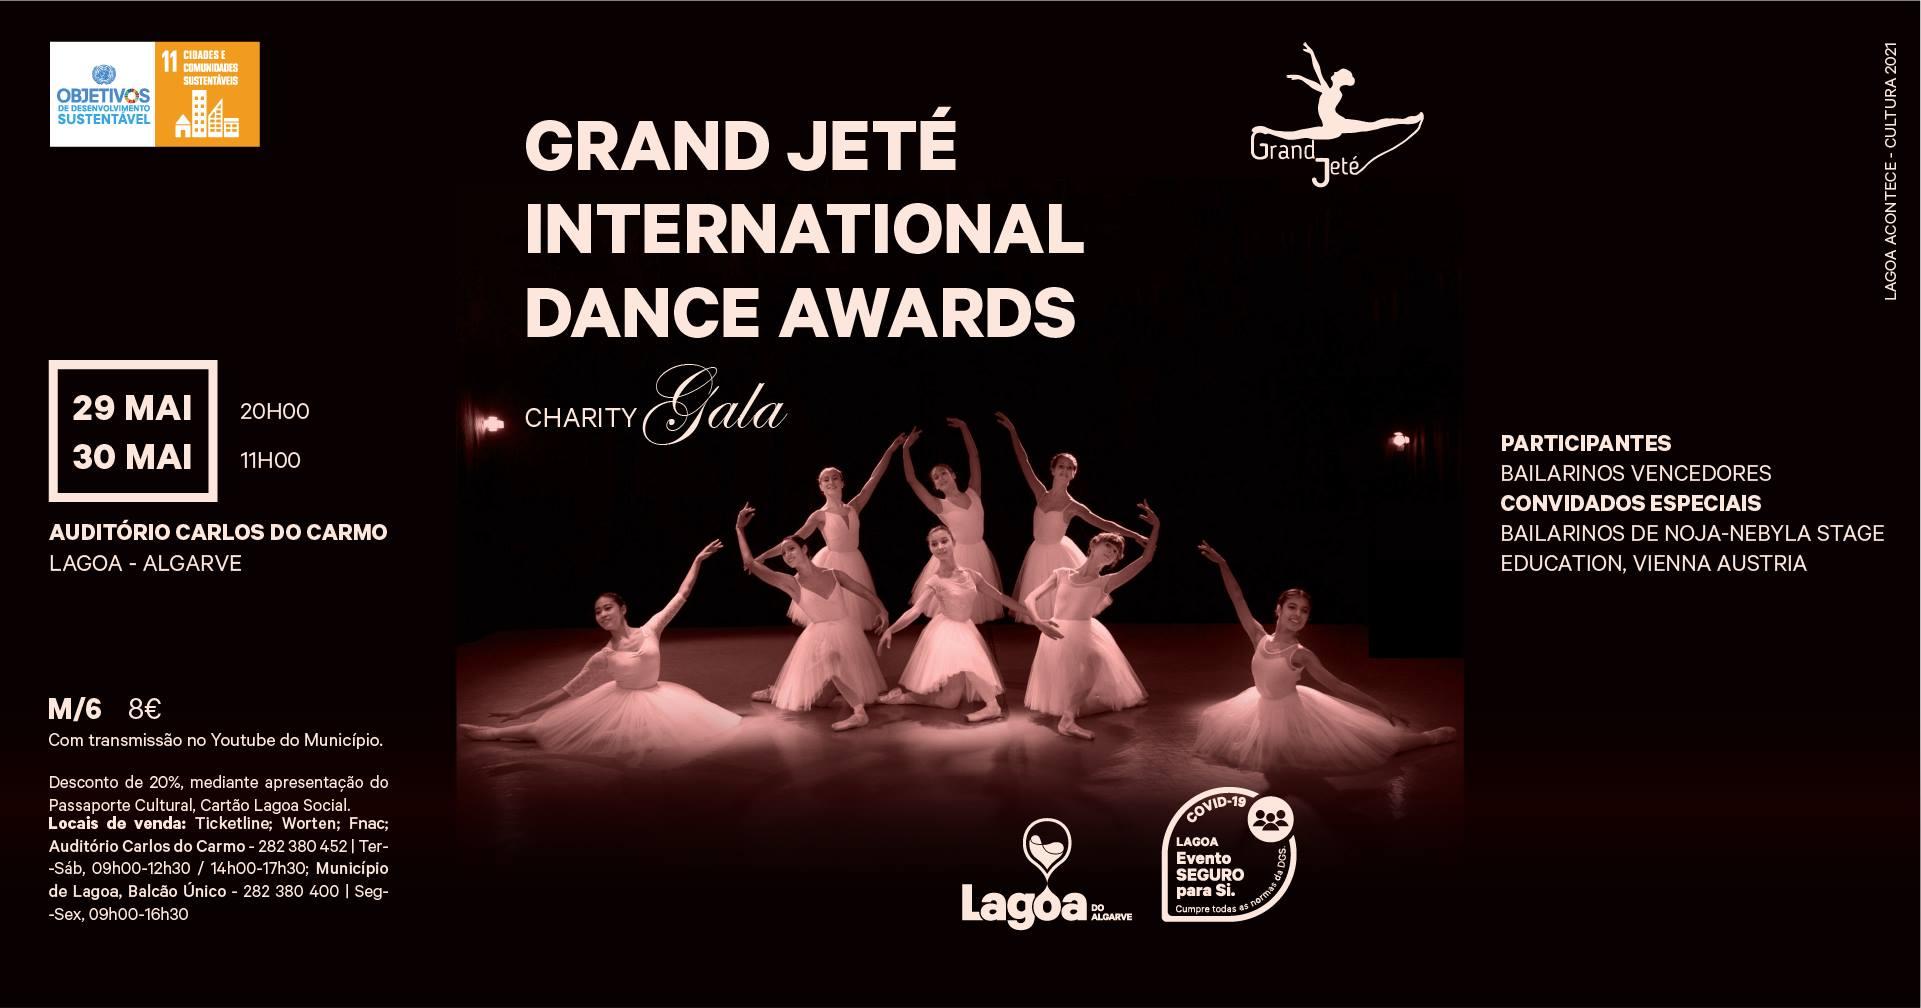 Grand Jeté International Dance Awards – Charity Gala